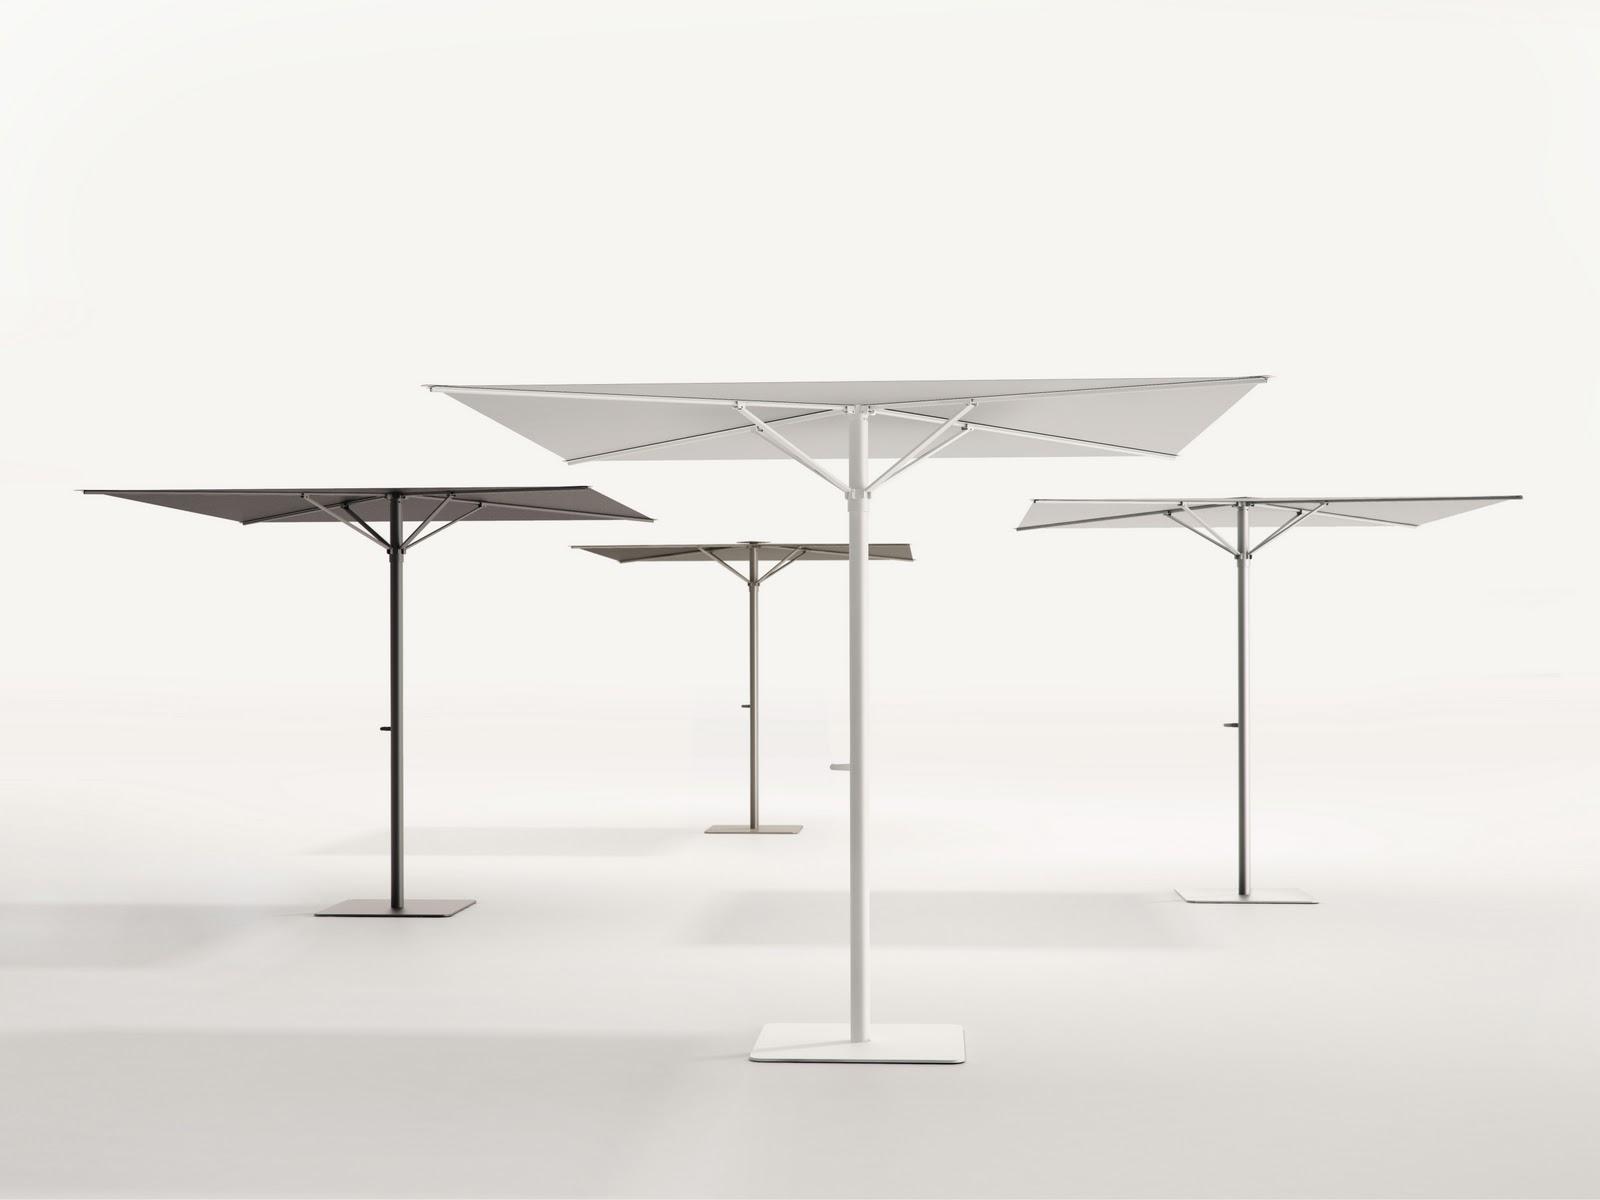 design tuinmeubelen contemporaire buitenomgevingen www. Black Bedroom Furniture Sets. Home Design Ideas